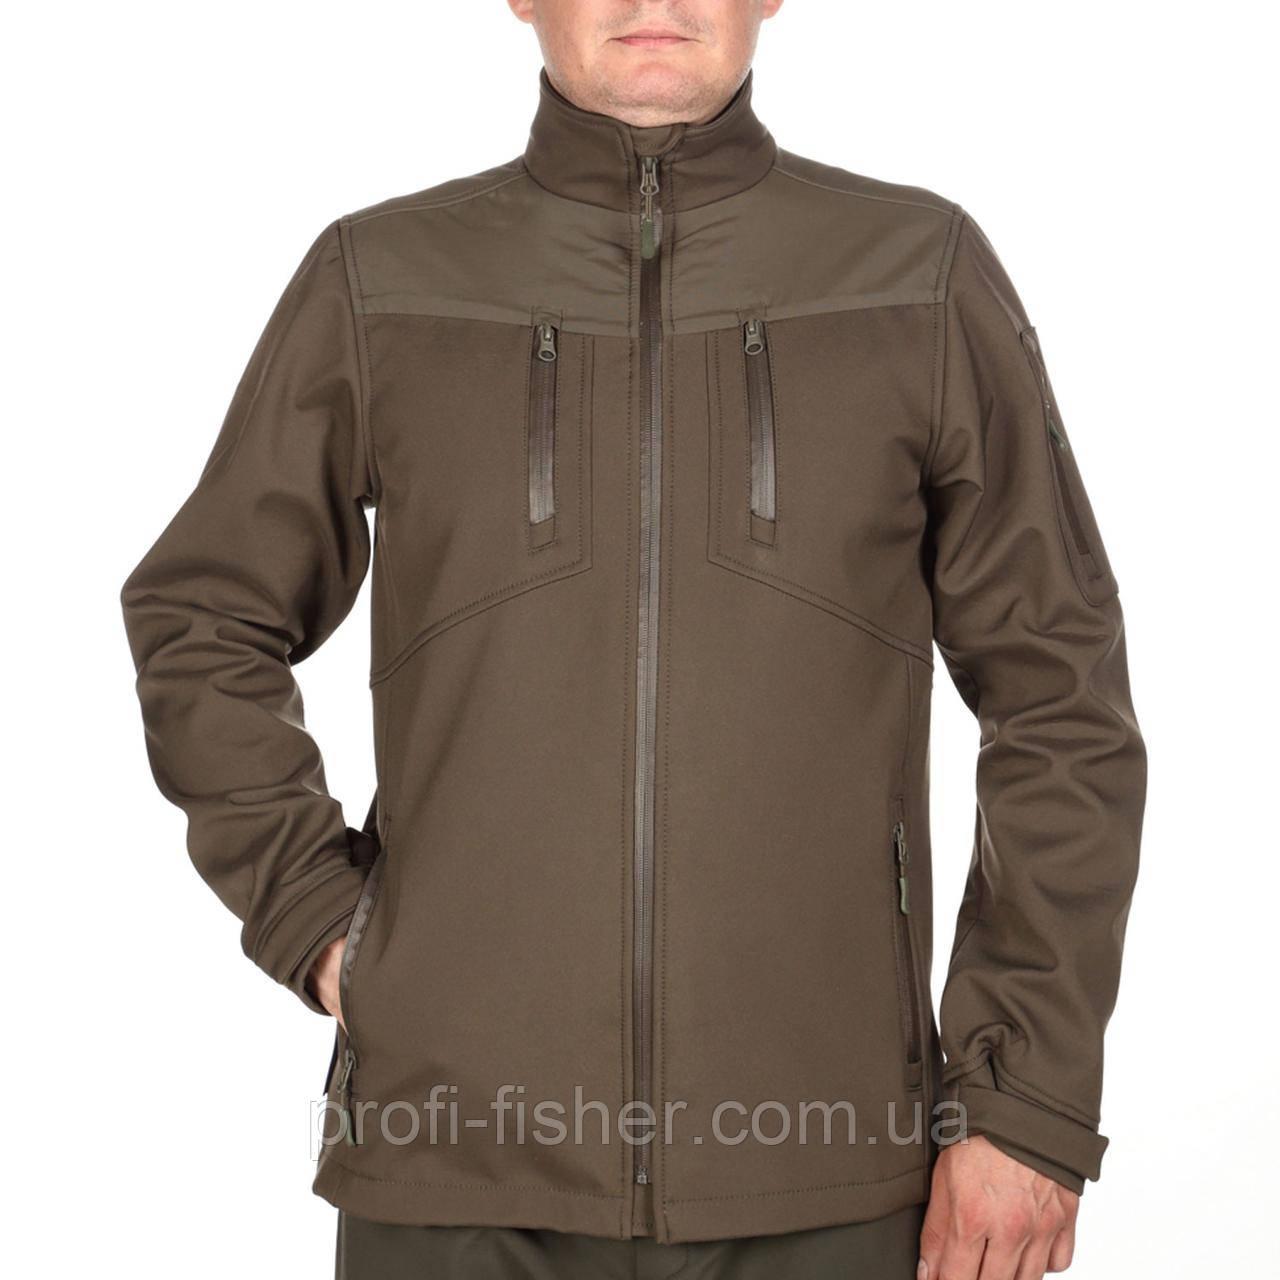 Куртка KLOST Soft Shell Sporttactic 5019 M Asphalt